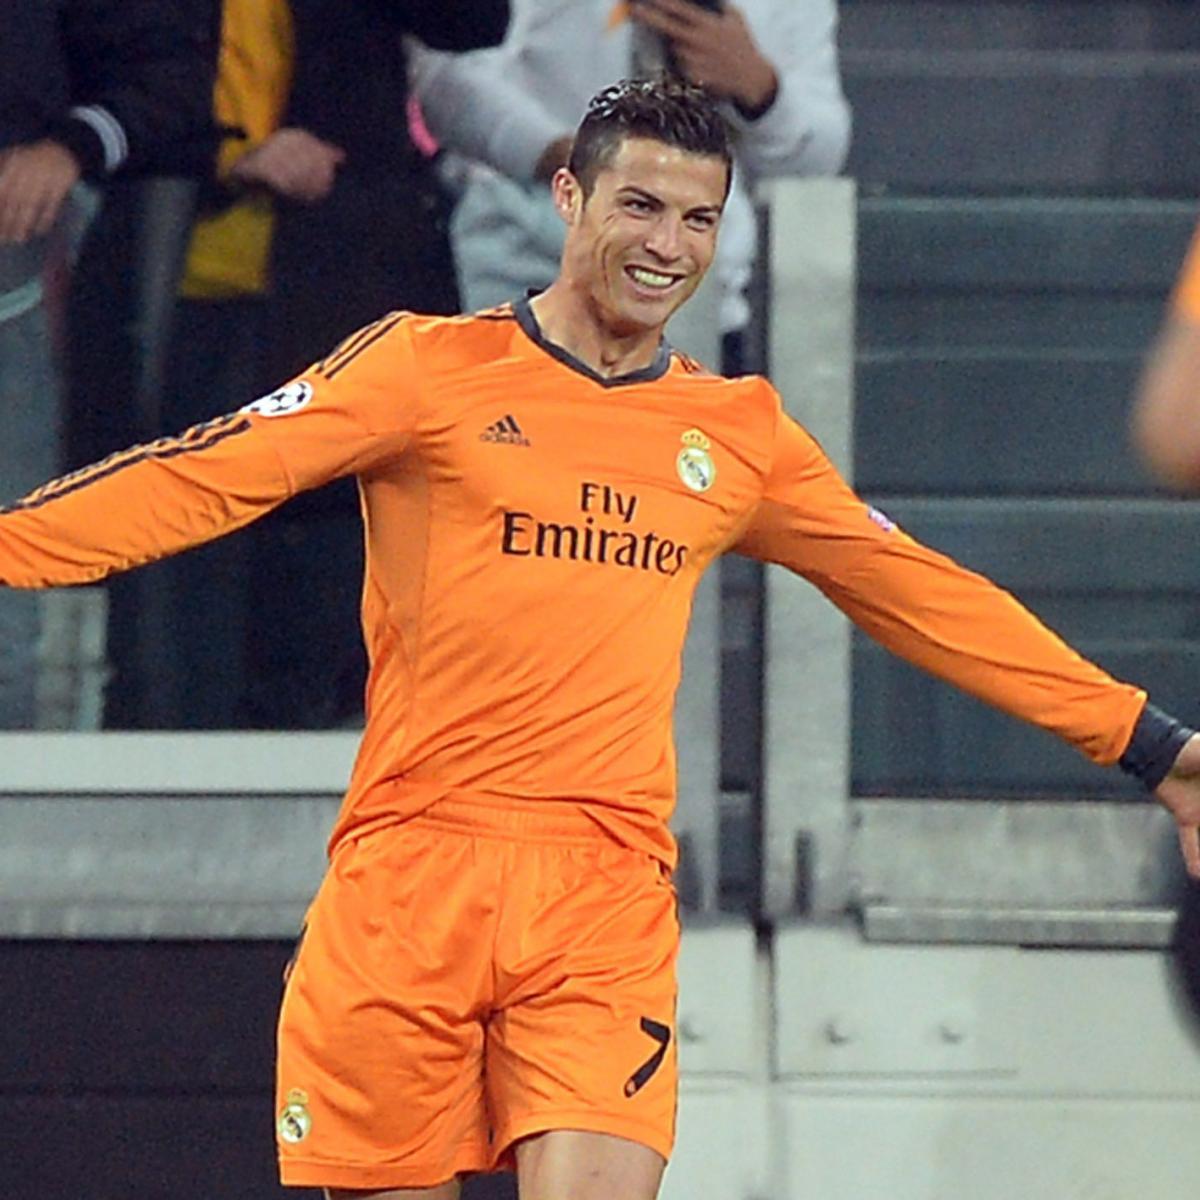 premium selection 0902e 090bd Cristiano Ronaldo Reacts After Breaking Lionel Messi's ...